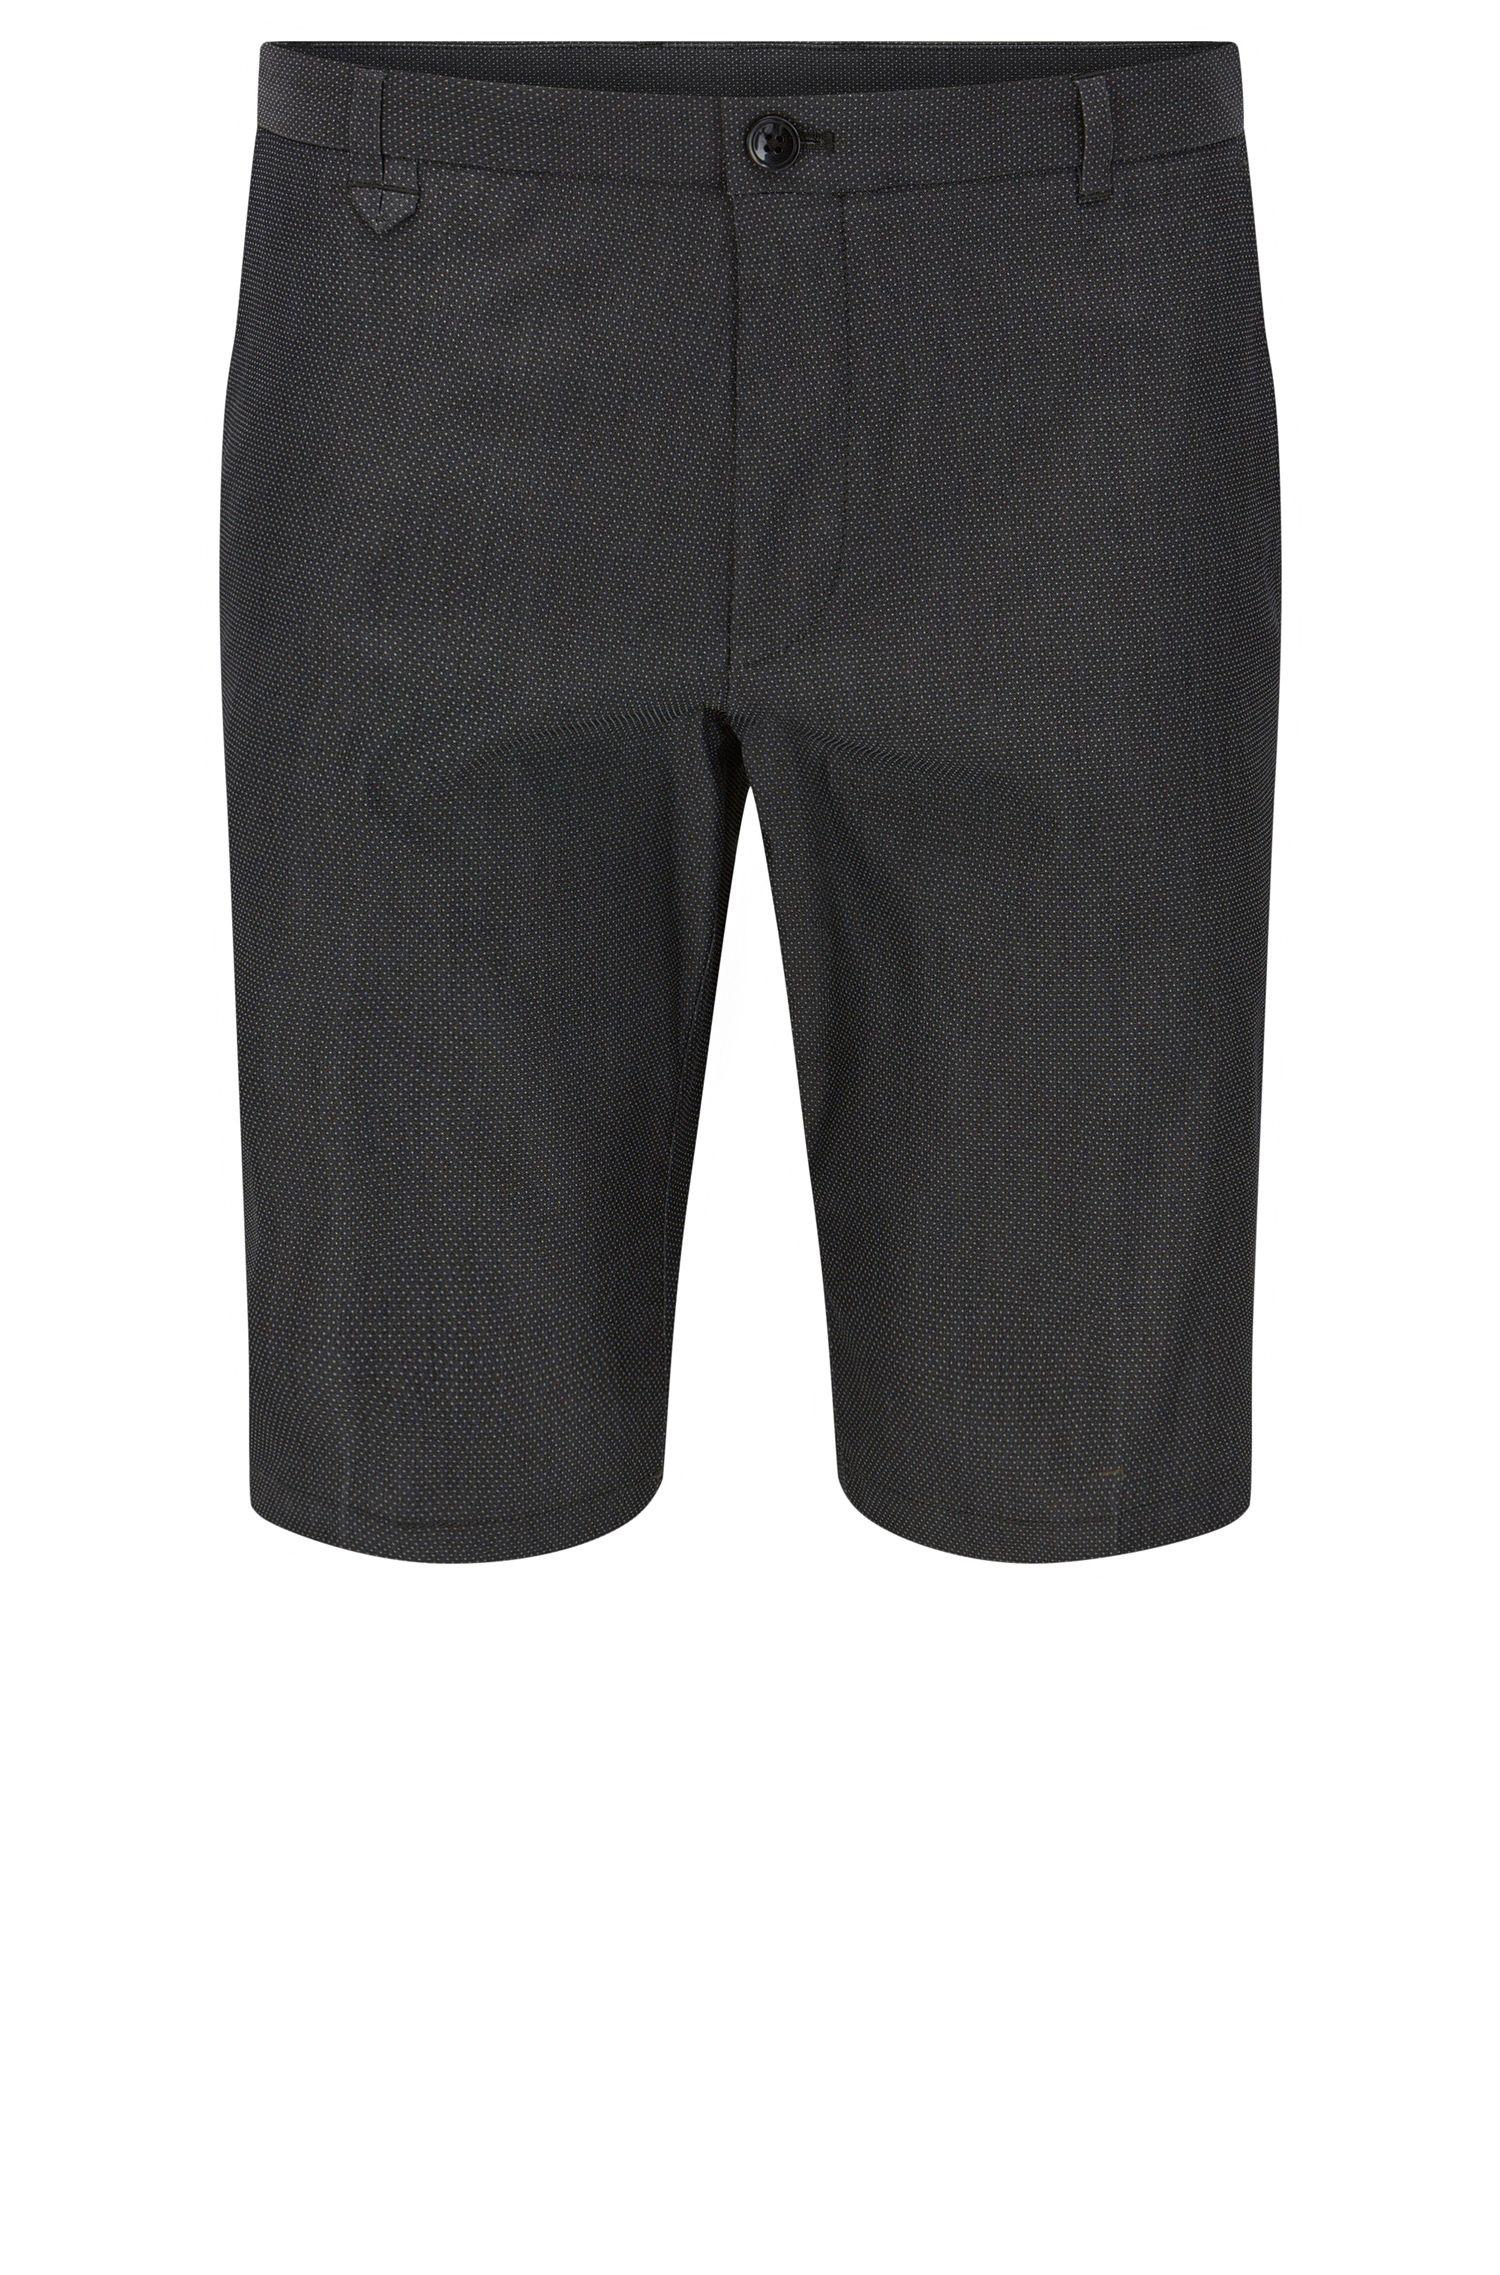 Pindot Stretch Cotton Blend Short, Slim Fit   Hano3